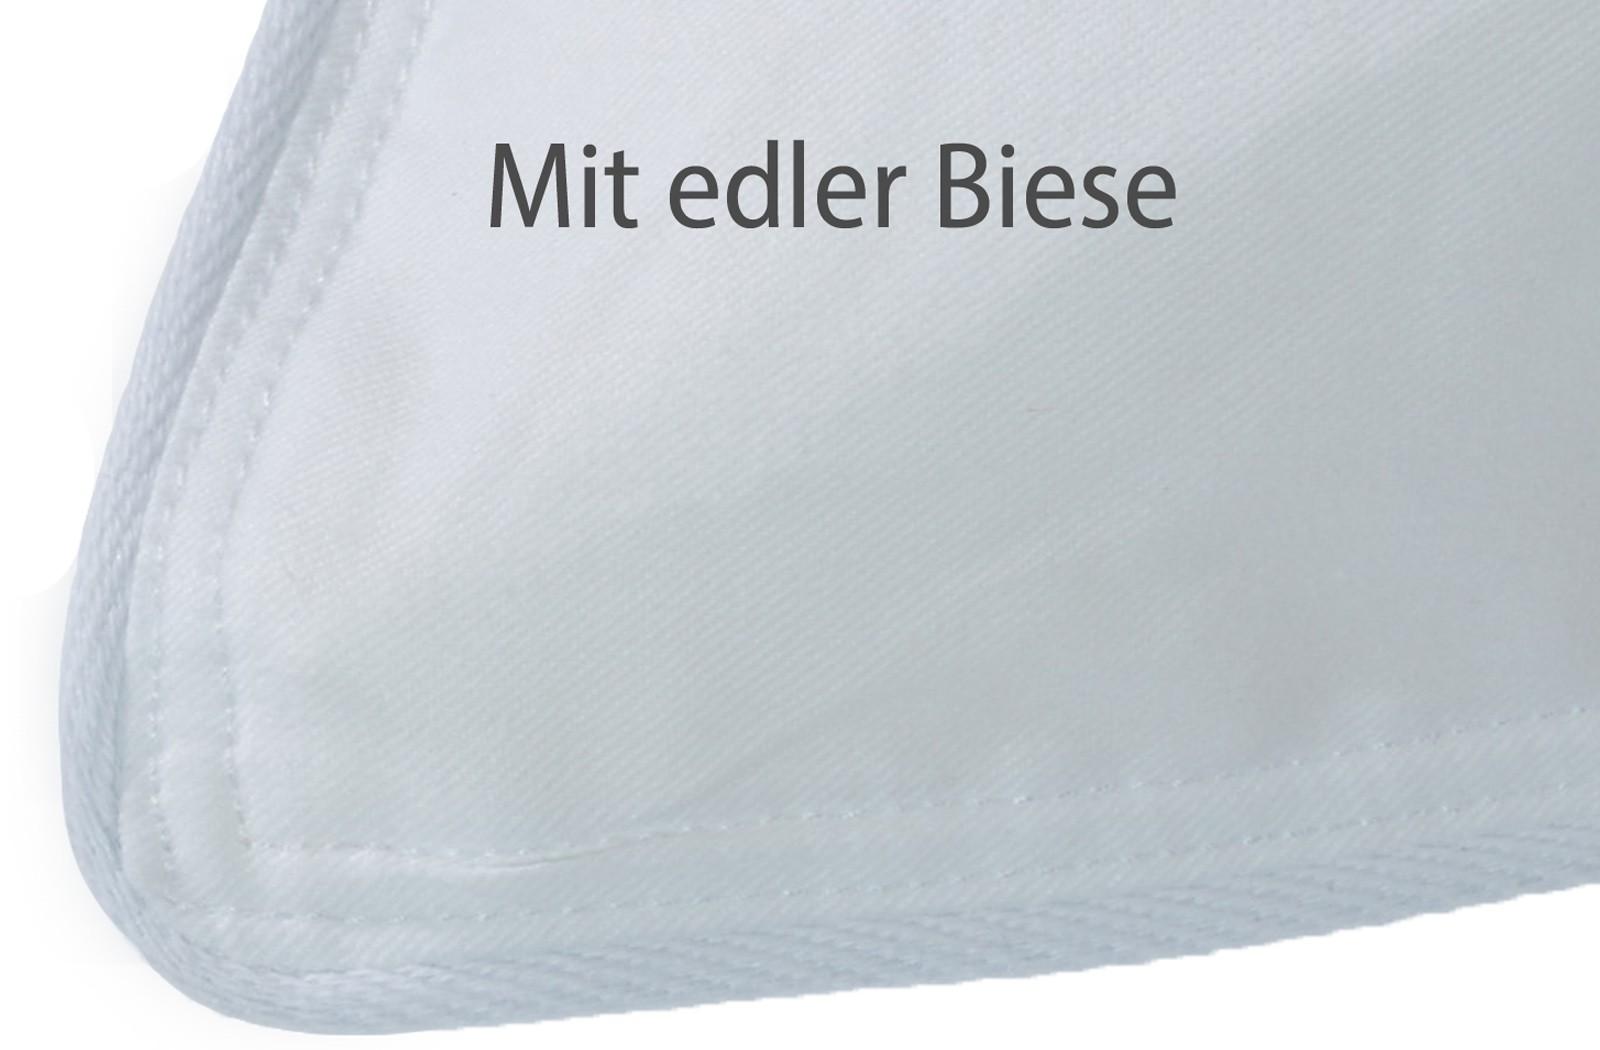 Kinder Daunendecke Bettdecke Baby Decke 100x135 100% Gänse-Daunen Kai – Bild 3